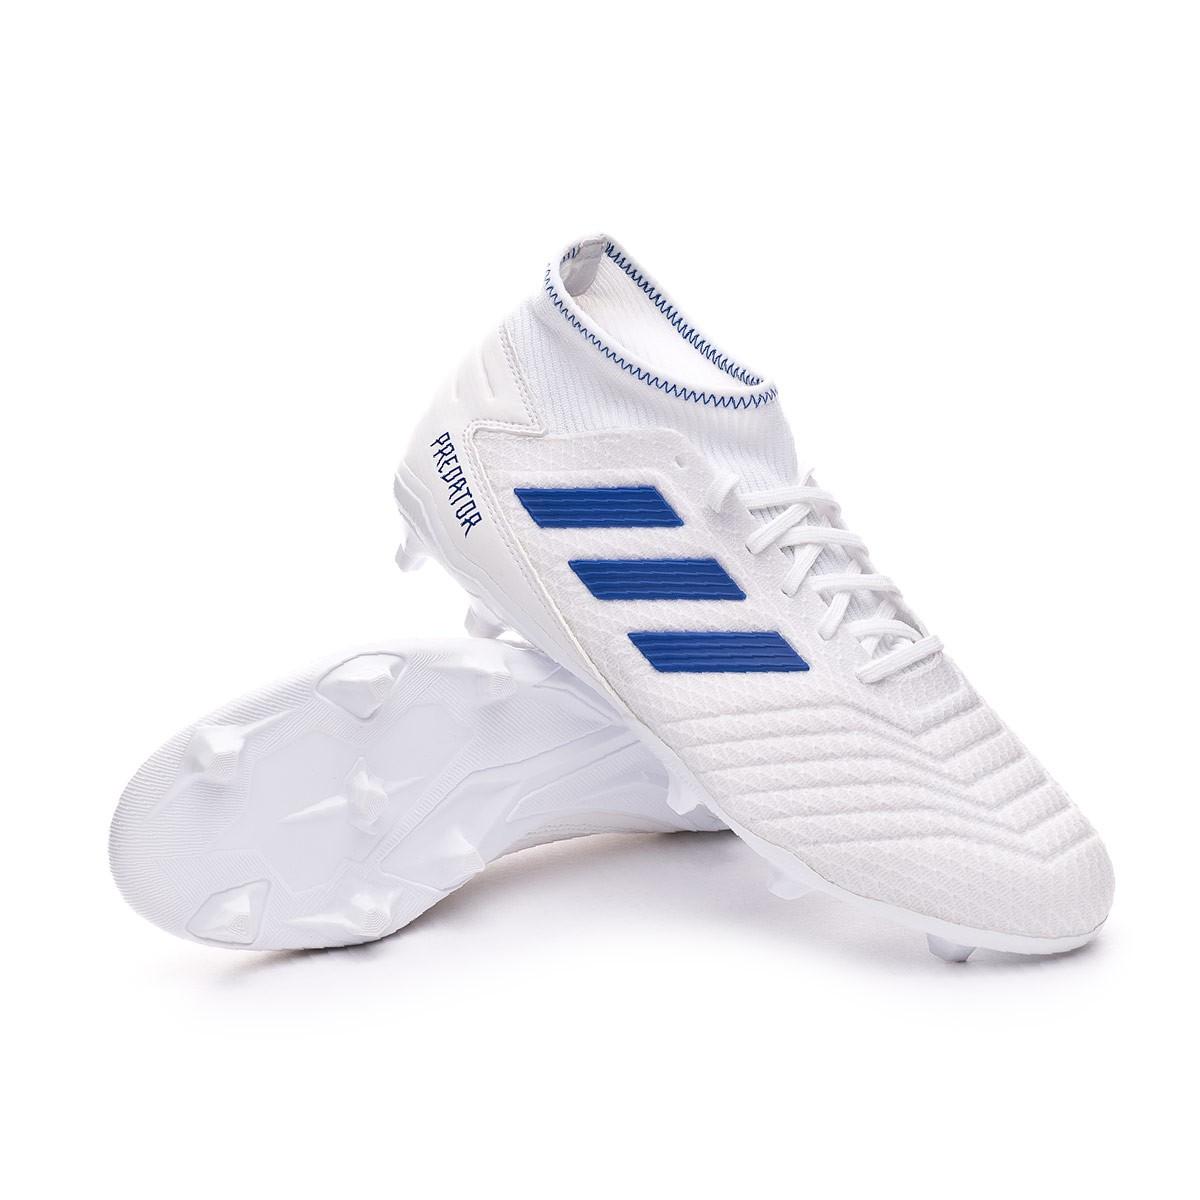 Chaussure de foot adidas Predator 19.3 FG